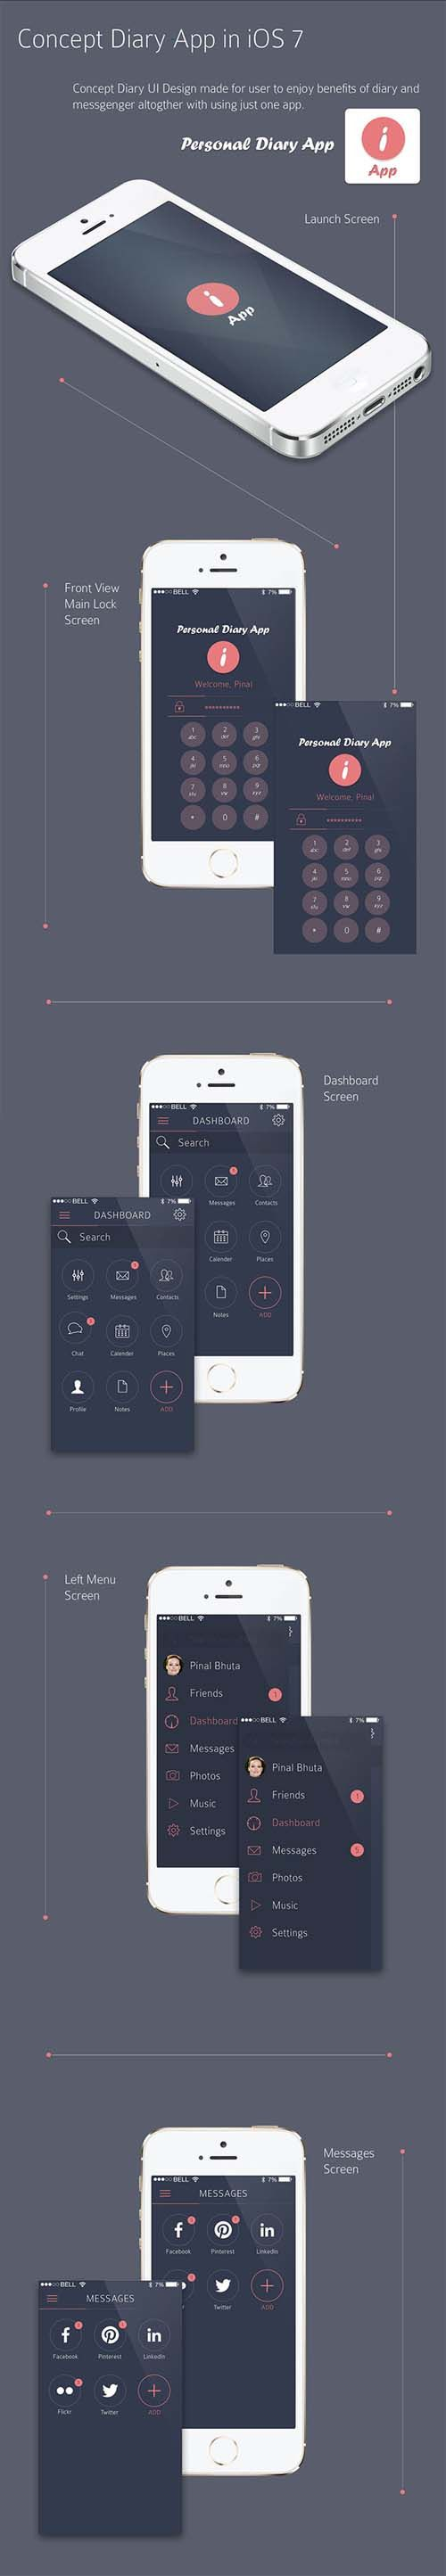 Personal Diary Iphone App